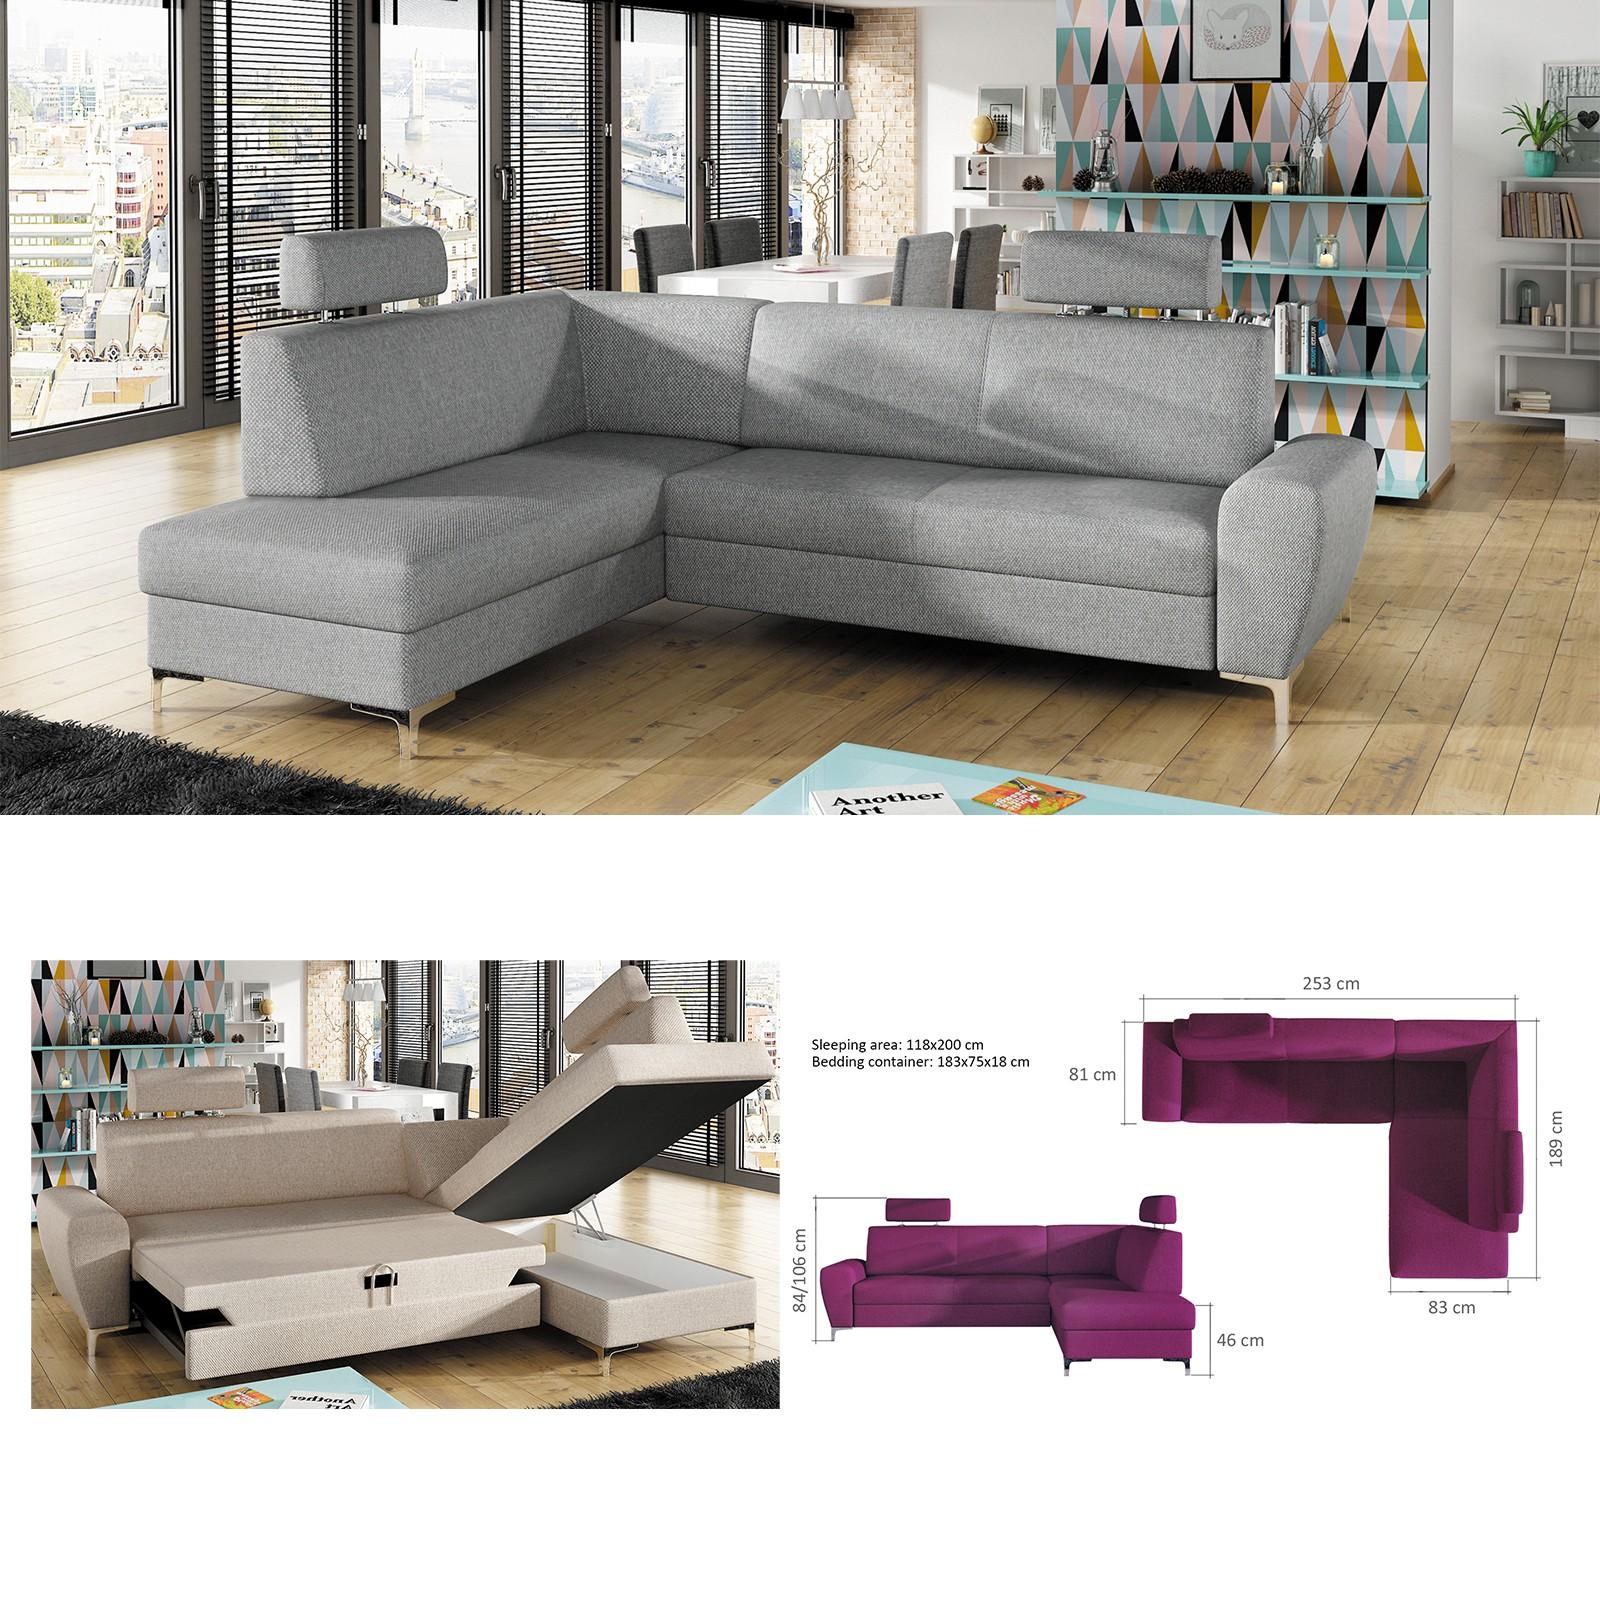 BMF \'RINO\' MODERN Corner Sofa Bed Storage CHROME LEGS Faux Leather/Fabric  LF 2003816000002 | eBay